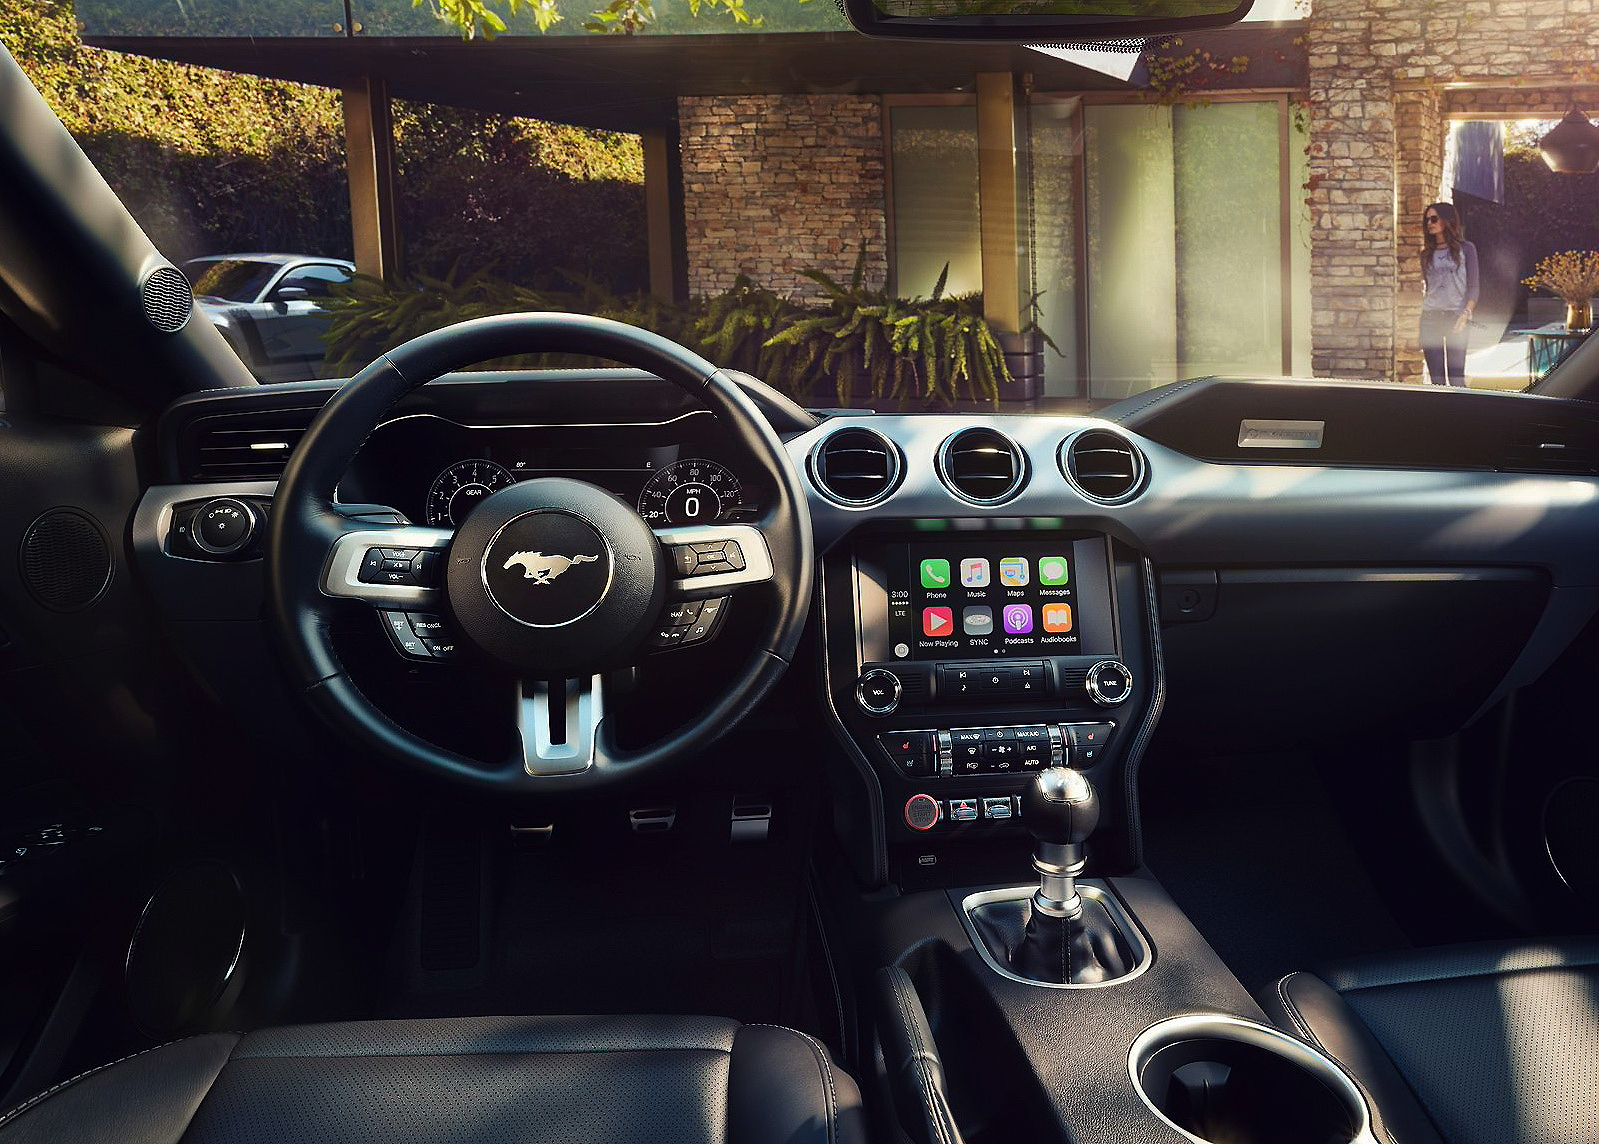 Ford Mustang 5.0 418 CV., la leyenda continúa